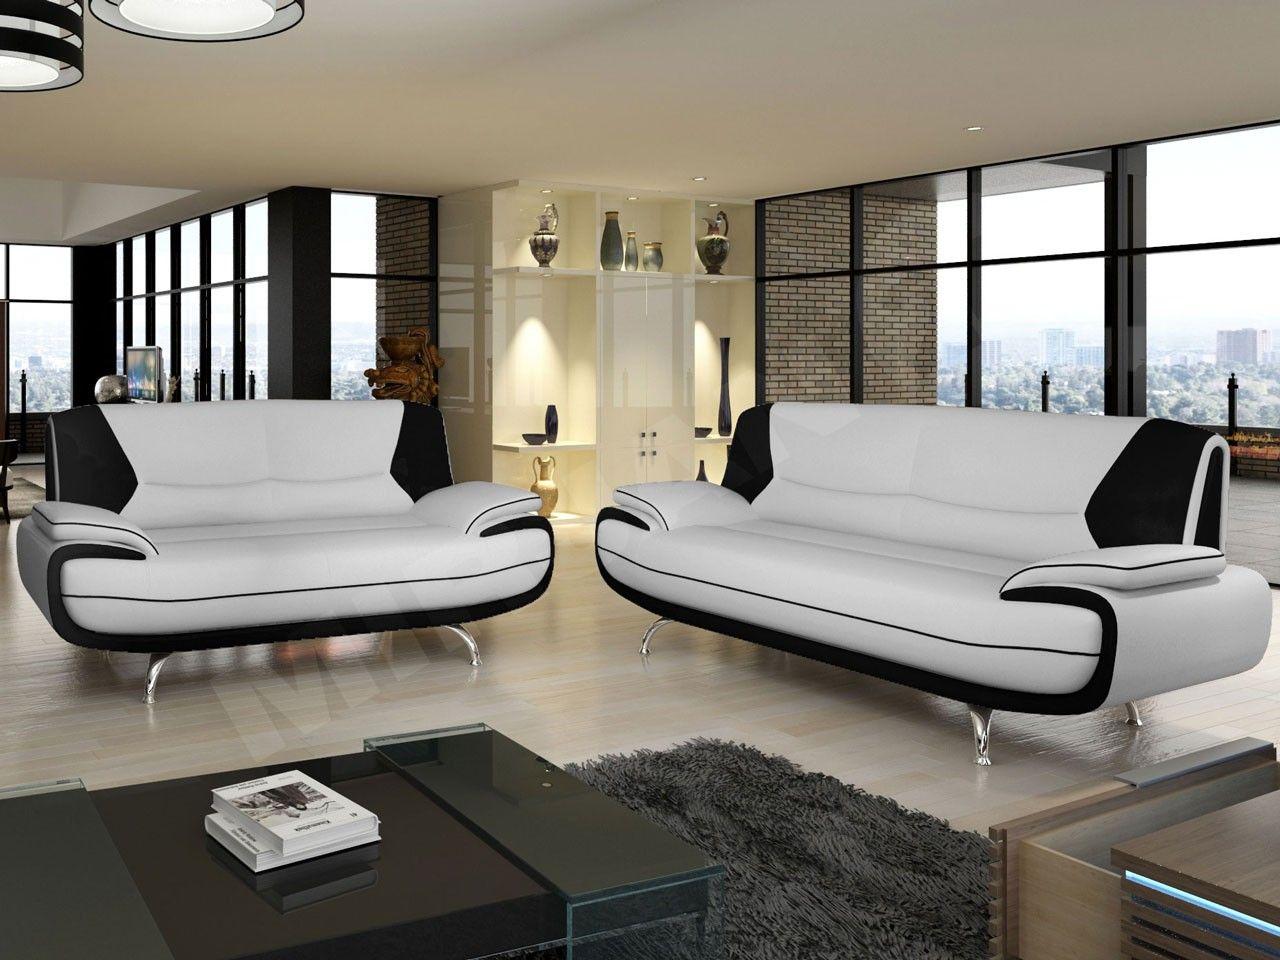 Centra Meubel Bv : Sefa meubel dé meubelzaak in rotterdam sefa meubel